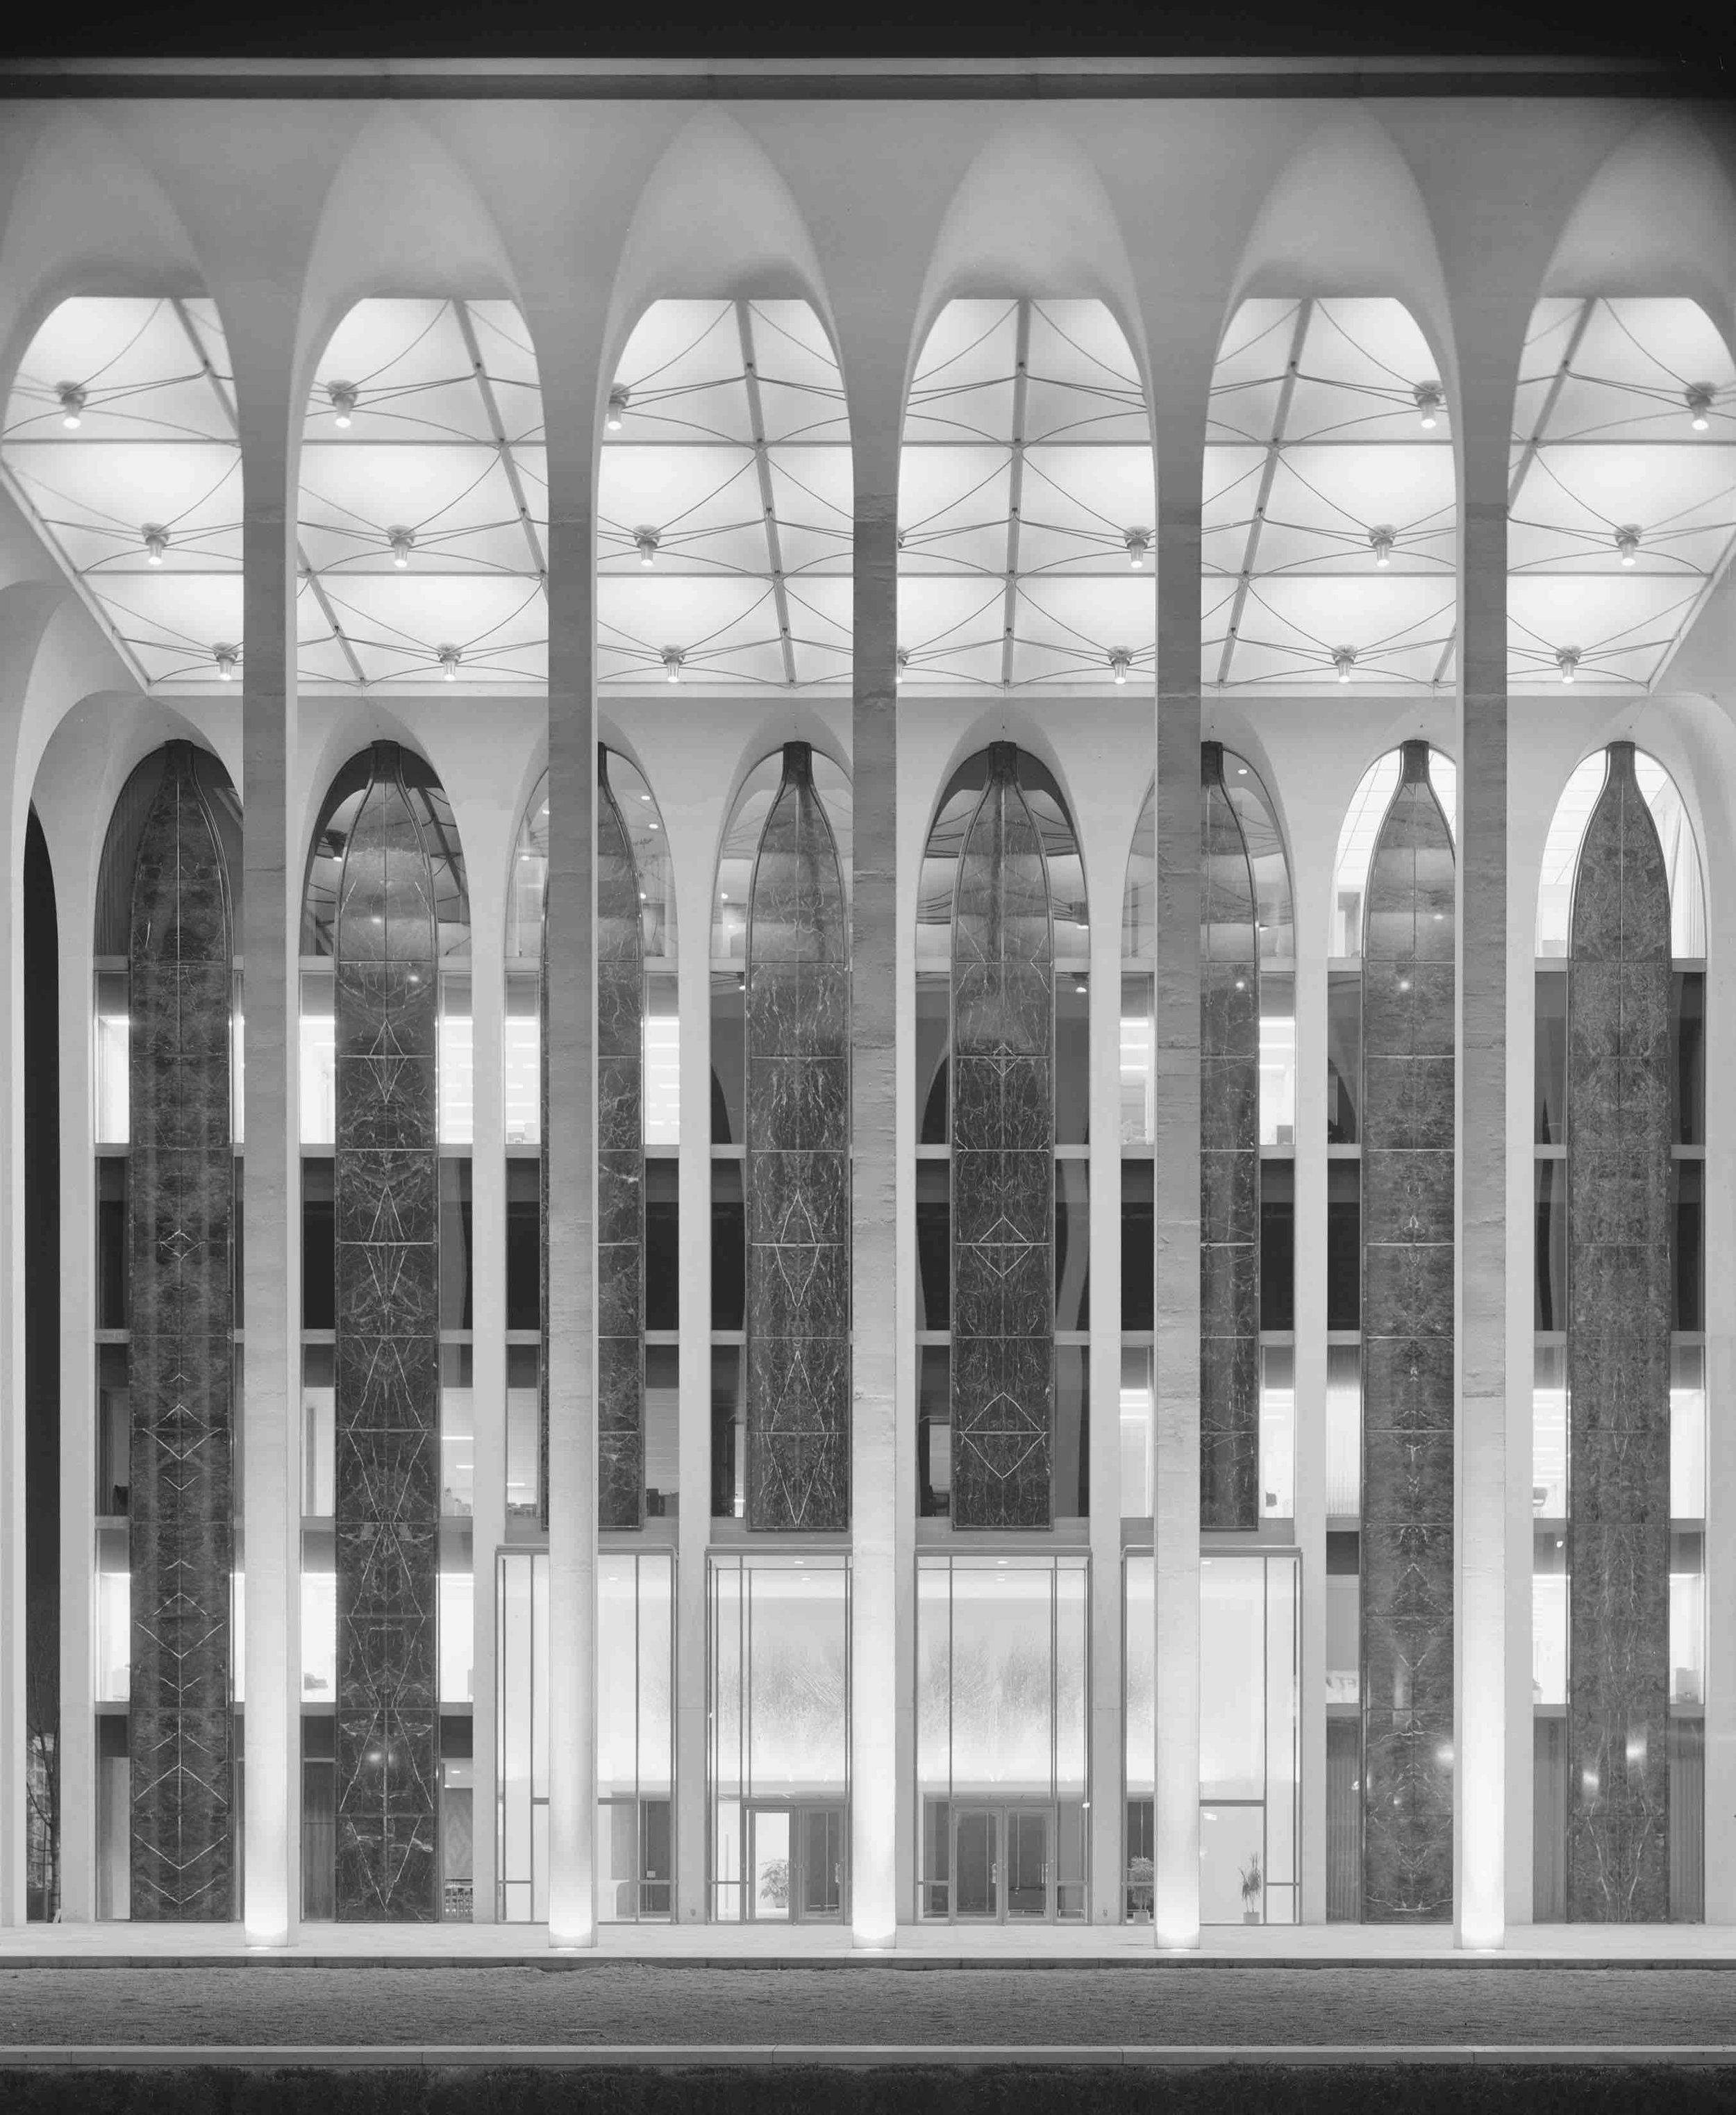 Minoru Yamasaki, Northwestern Mutual Life Building (Minneapolis, MN) 1965